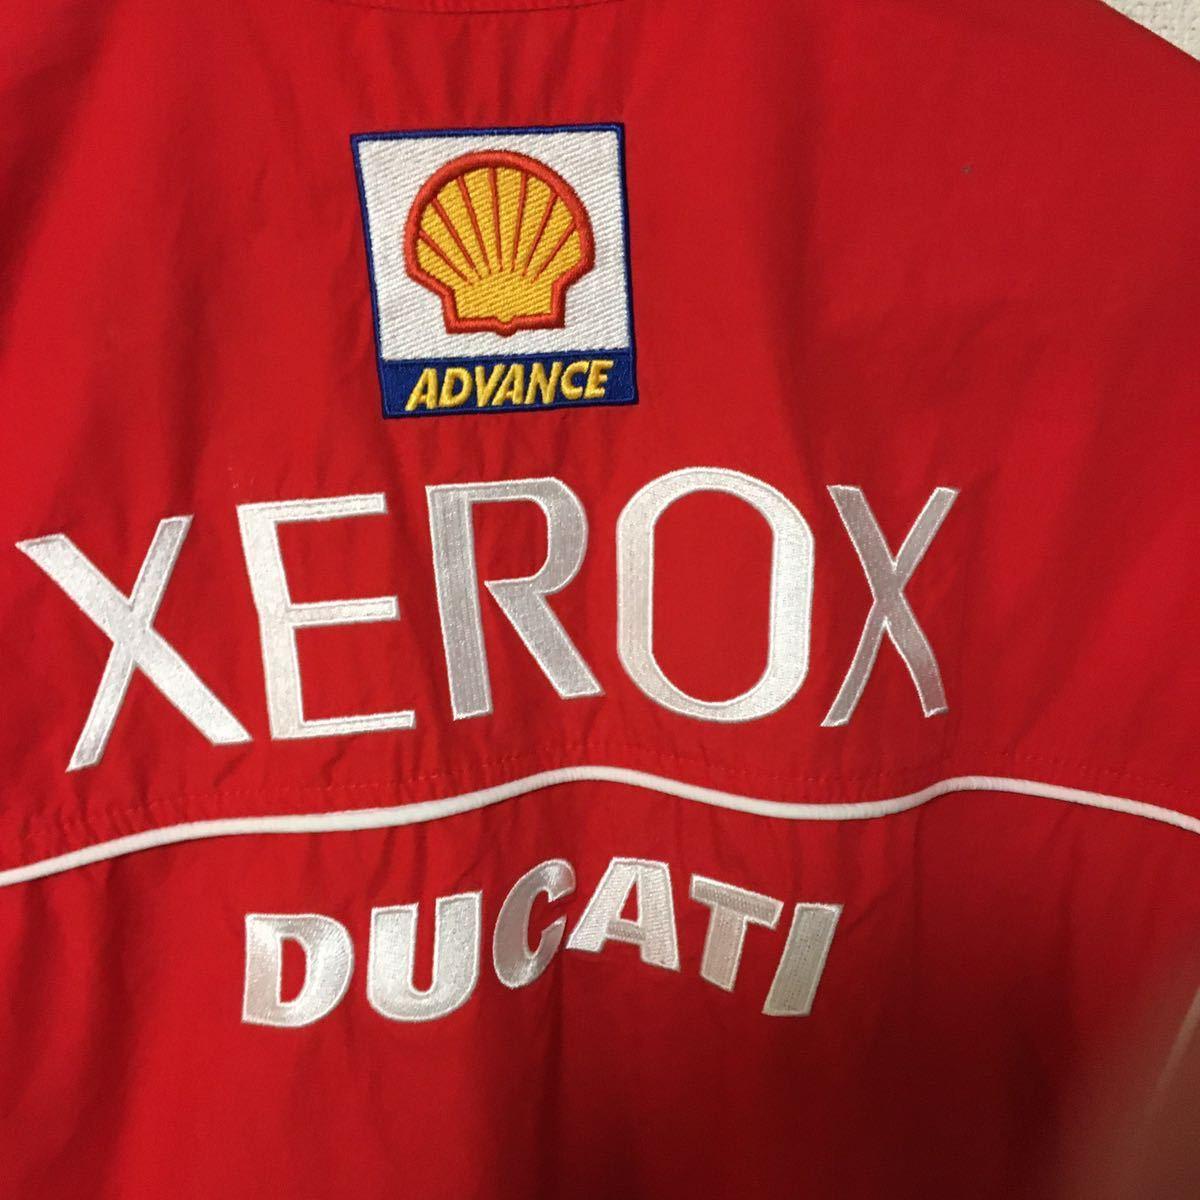 Ducati Corse Xerox super мотоцикл DUCATI CORSE XEROX короткий рукав кнопка рубашка женский / мужской tops красный